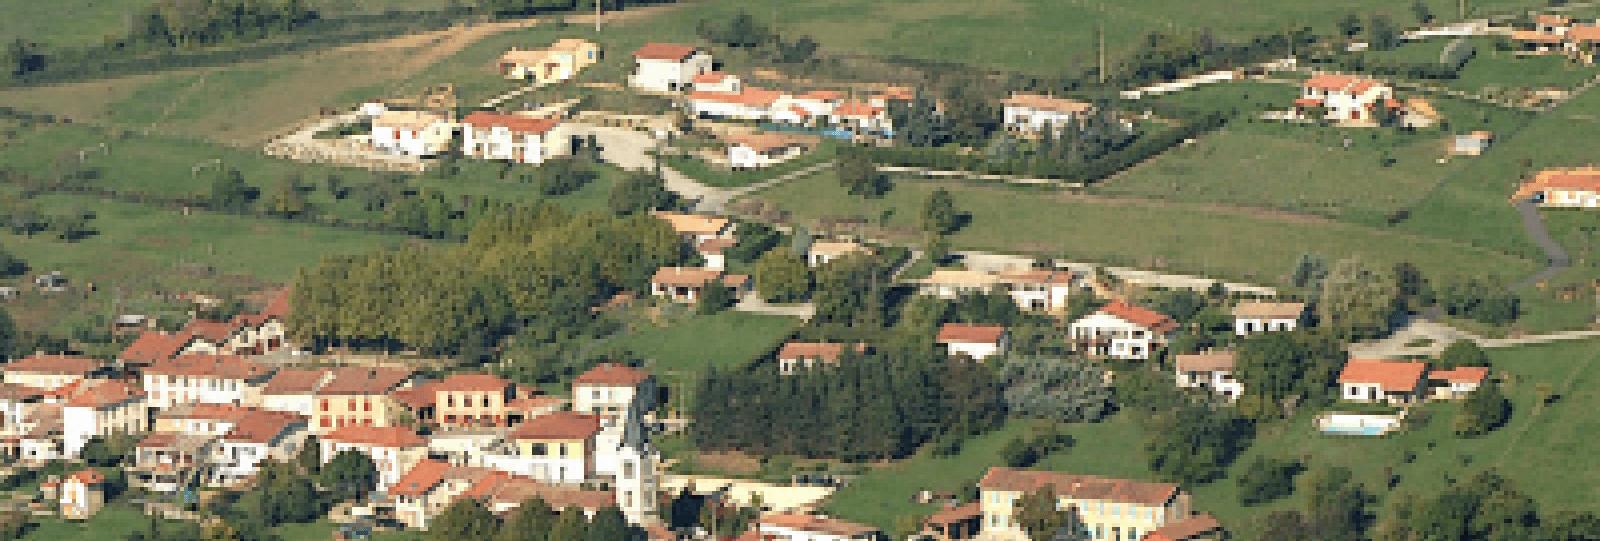 Commune de Valherbasse